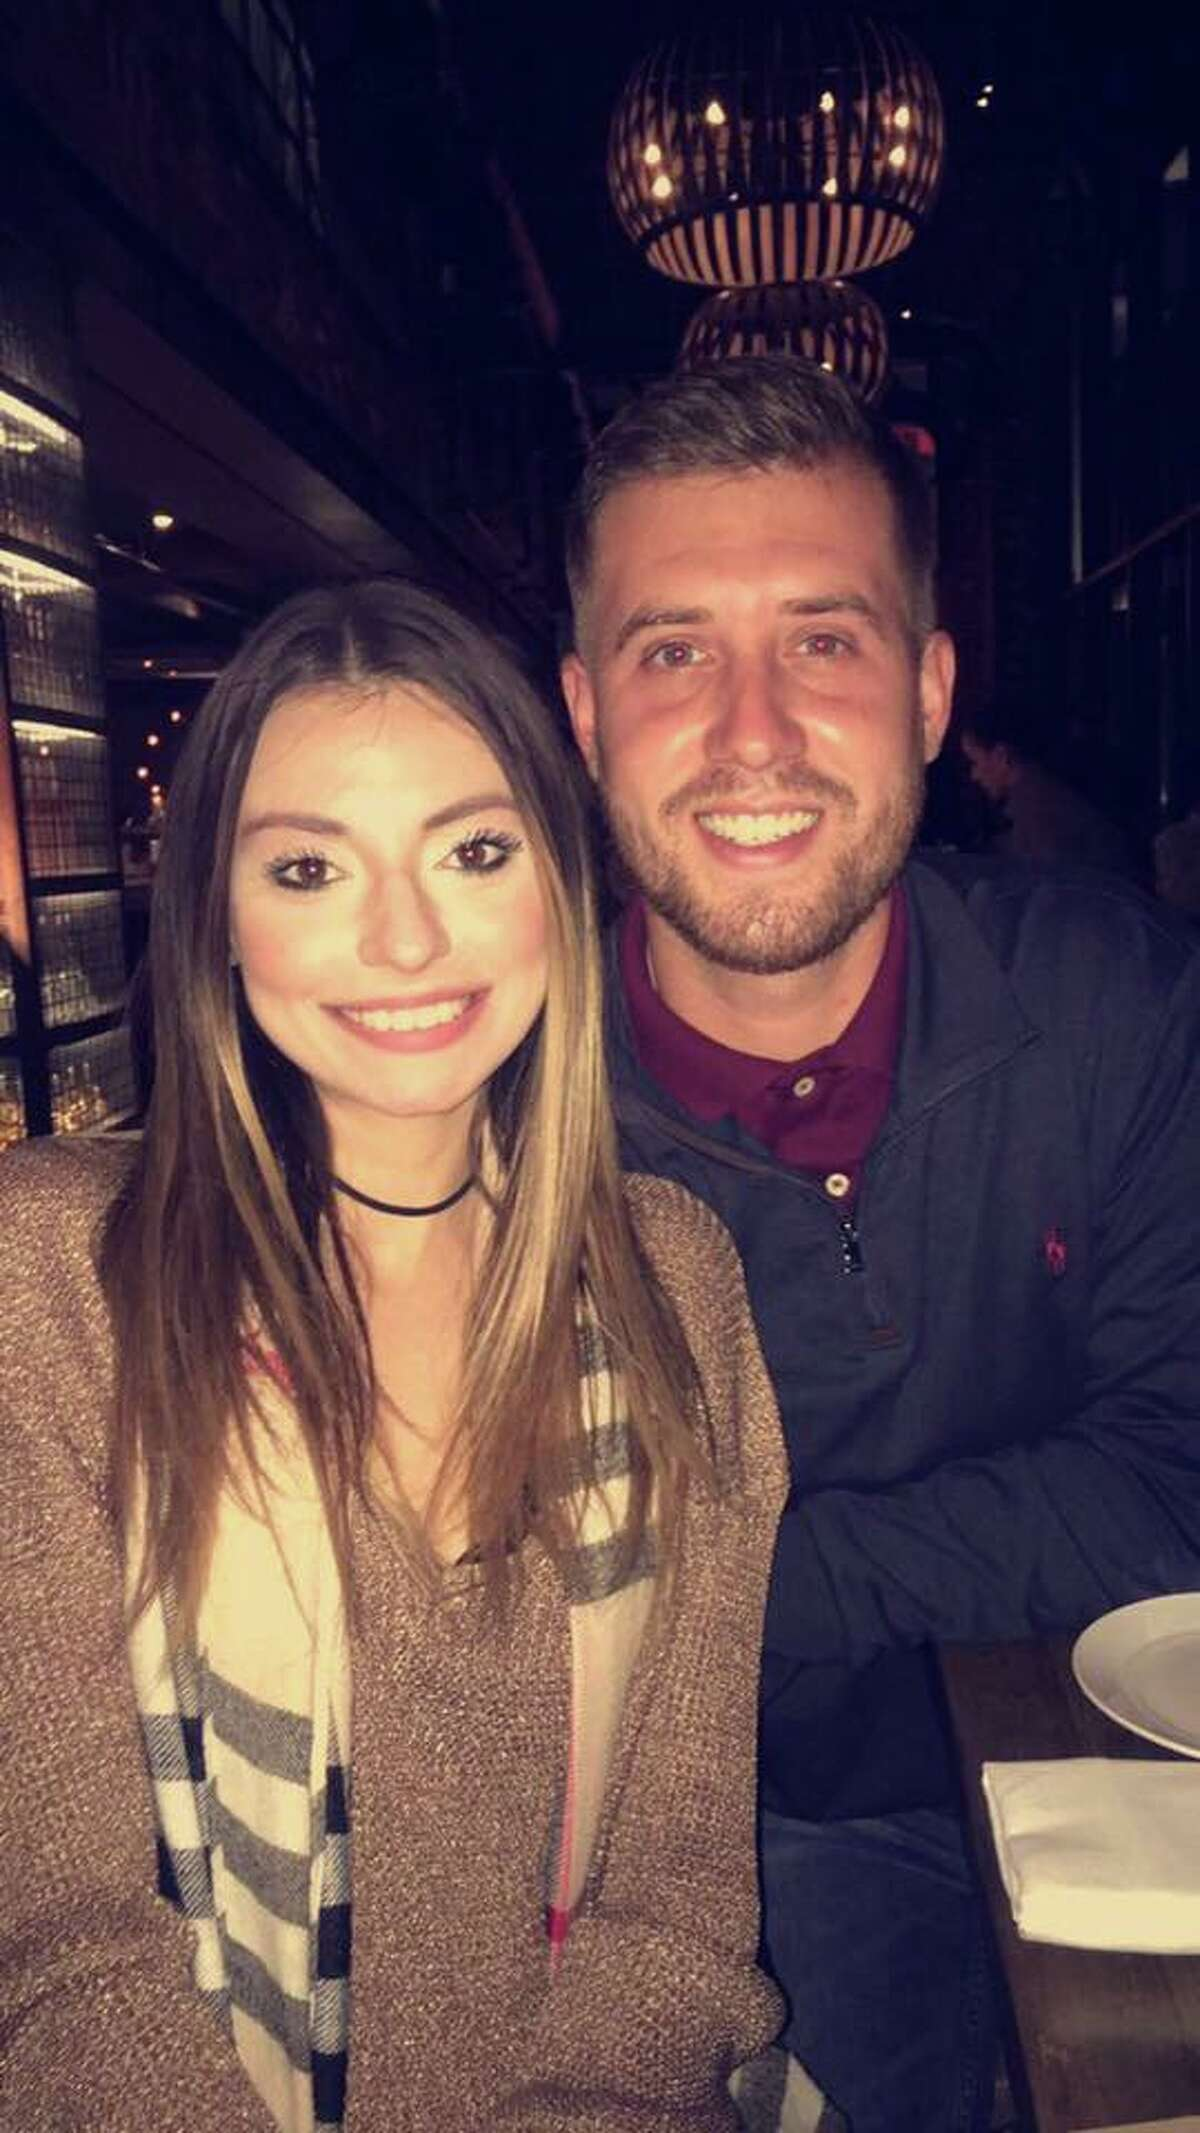 Ross Lebeau and his girlfriend, Sejla Tahirovic